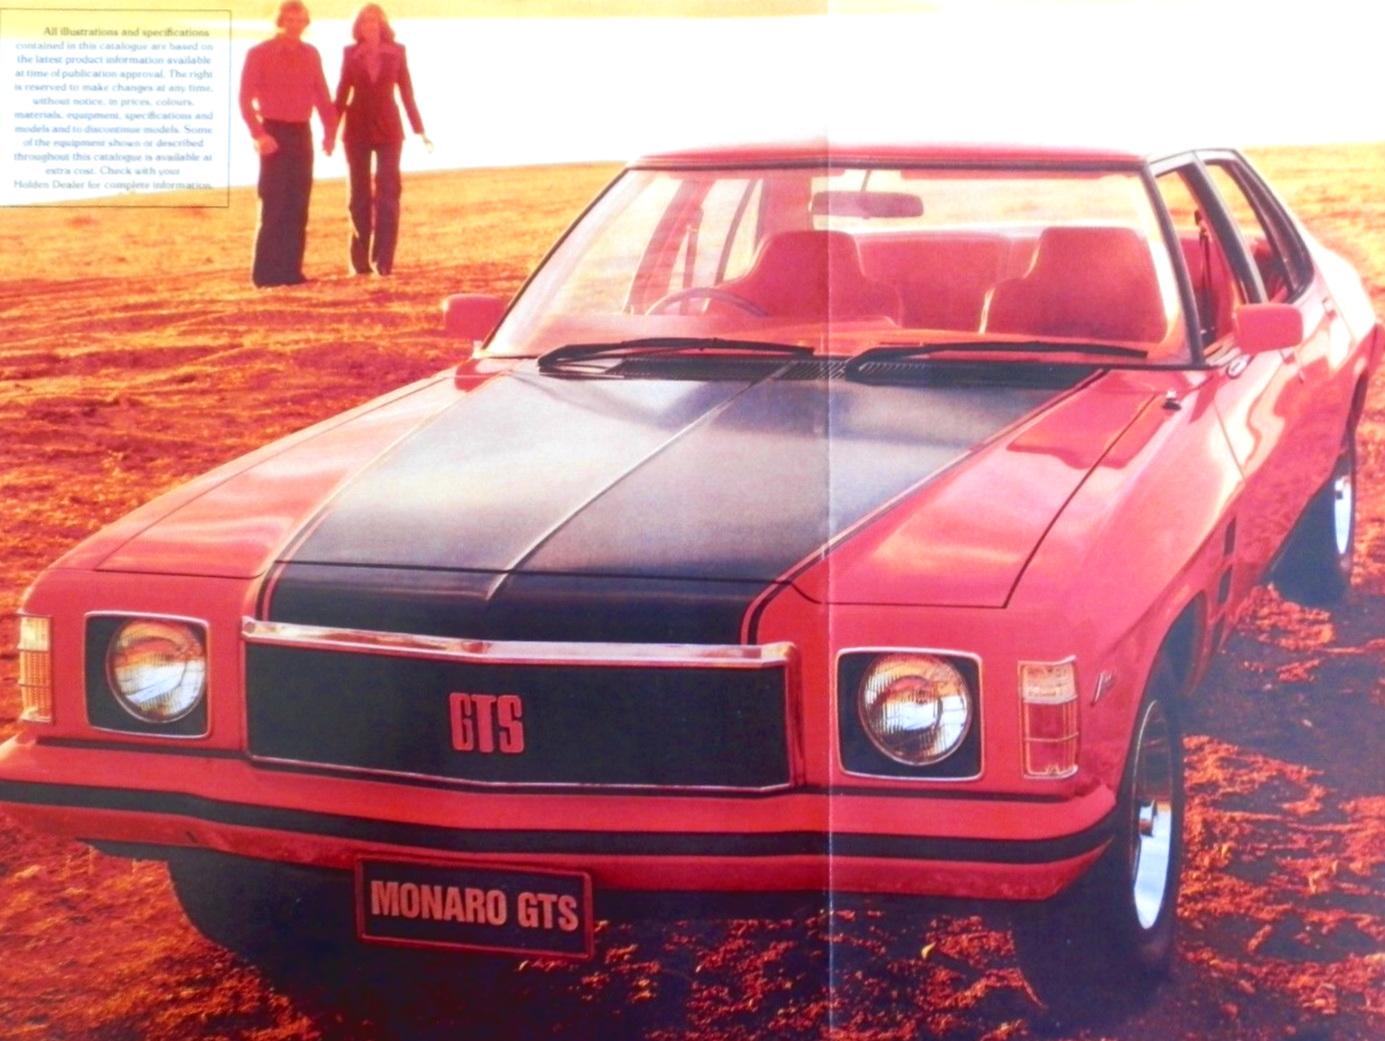 tunnelram.net_1976 Holden gts Monaro sedan.jpg